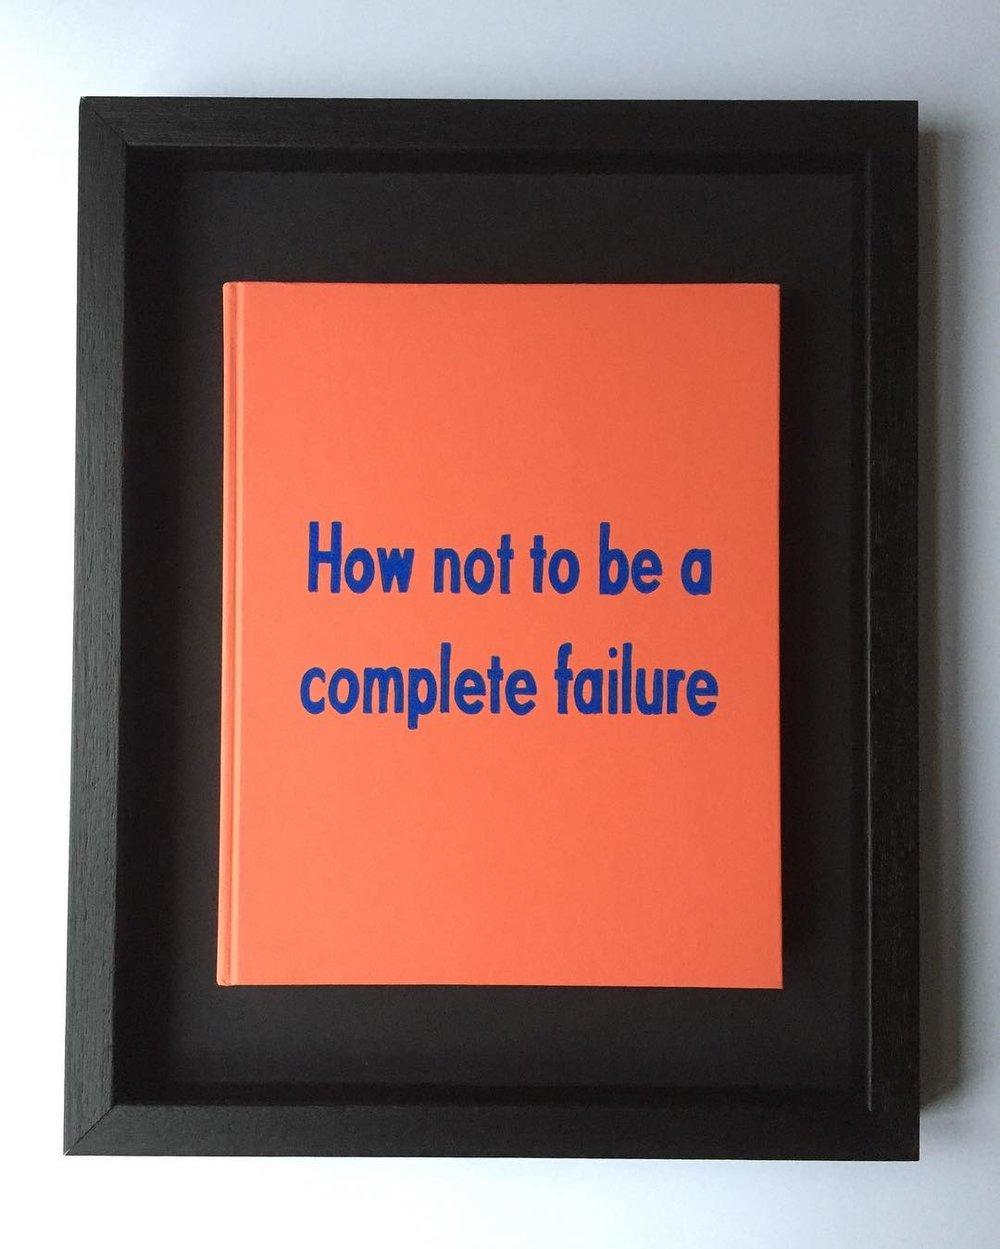 009 Complete Failure-johan-deckmann.jpg